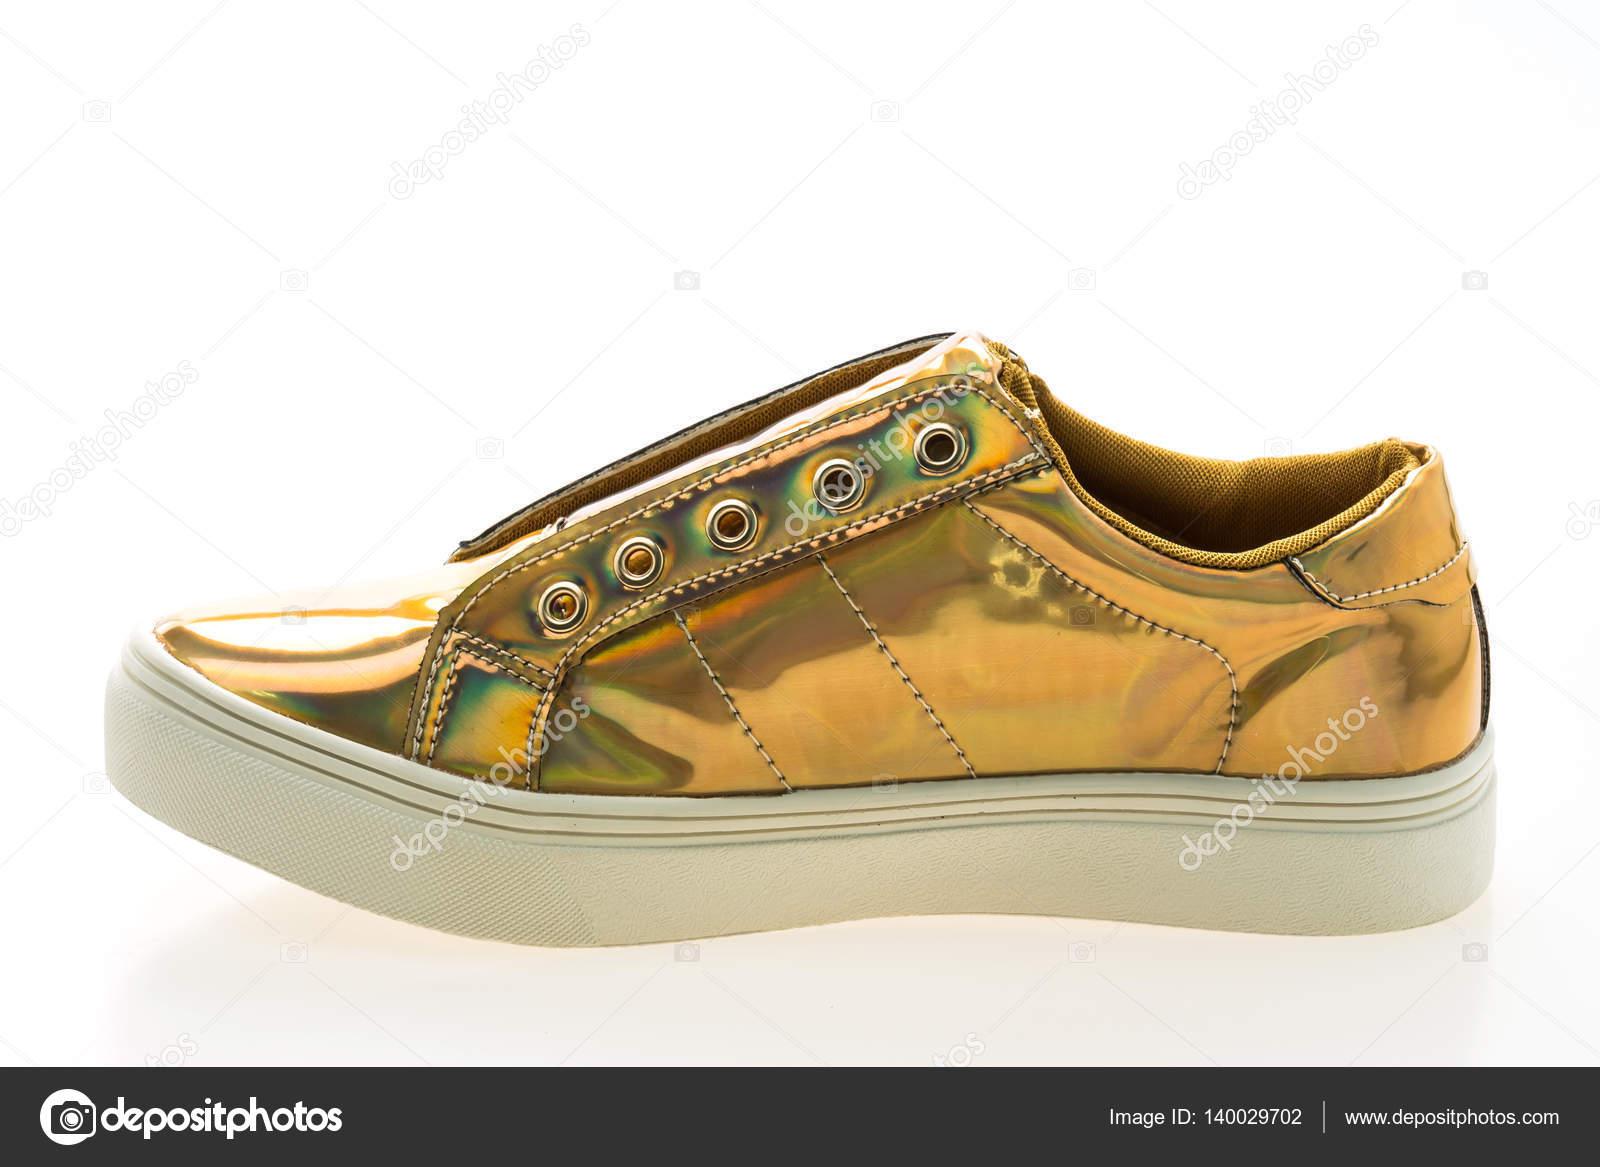 7286fe1da4a Παπούτσια μόδας και ύπουλος — Φωτογραφία Αρχείου © mrsiraphol #140029702